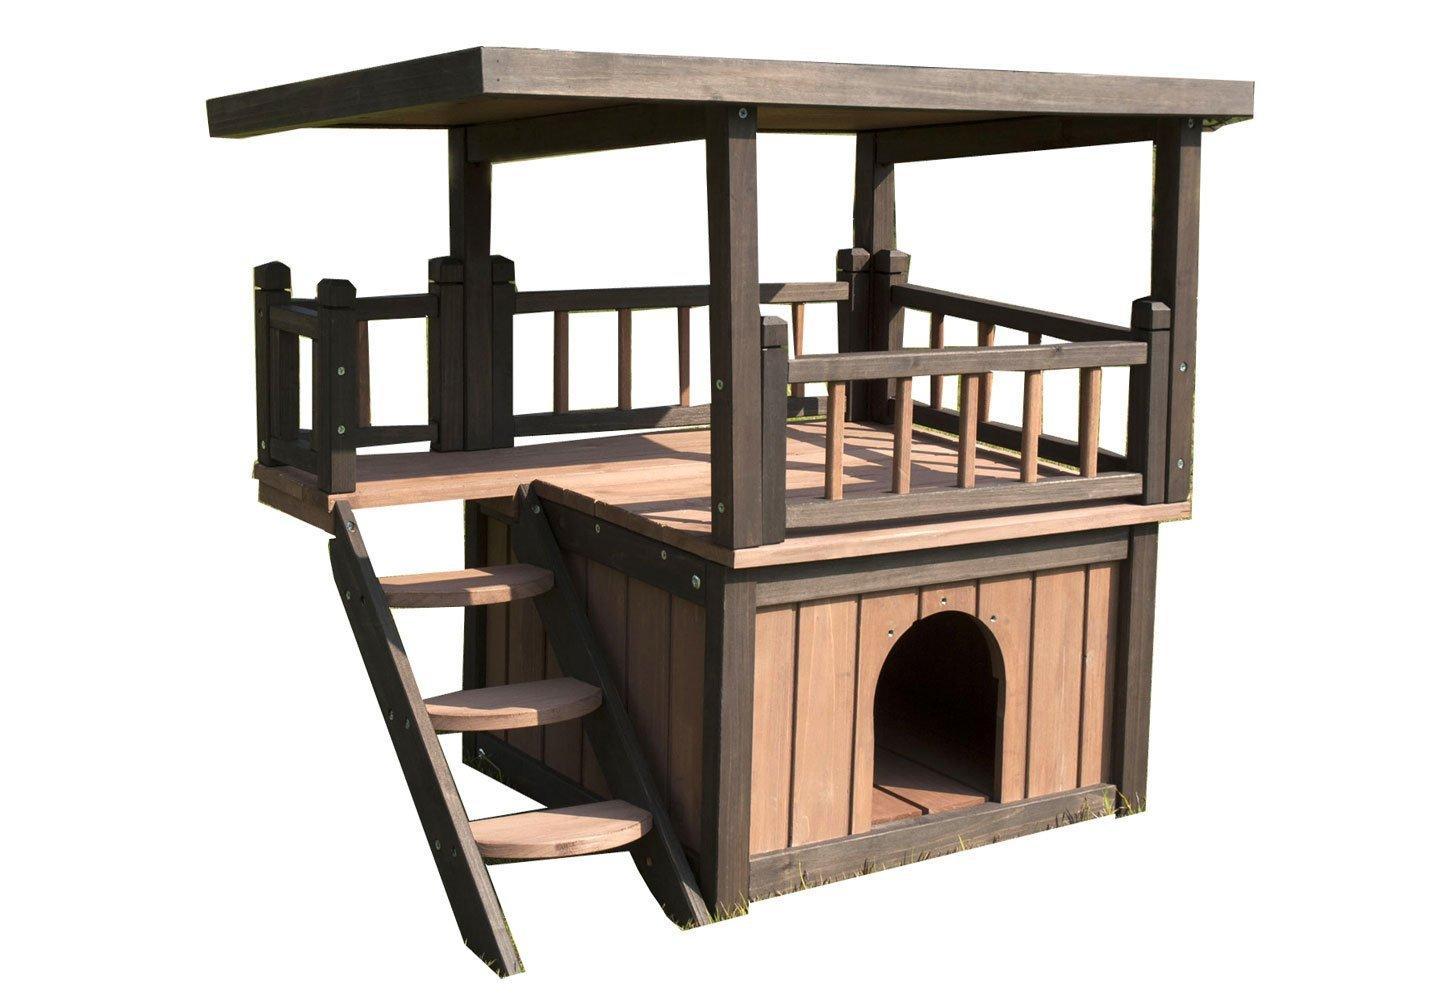 Cuccia per cani in legno tutte le cucce da esterno for Cucce per cani da esterno coibentate